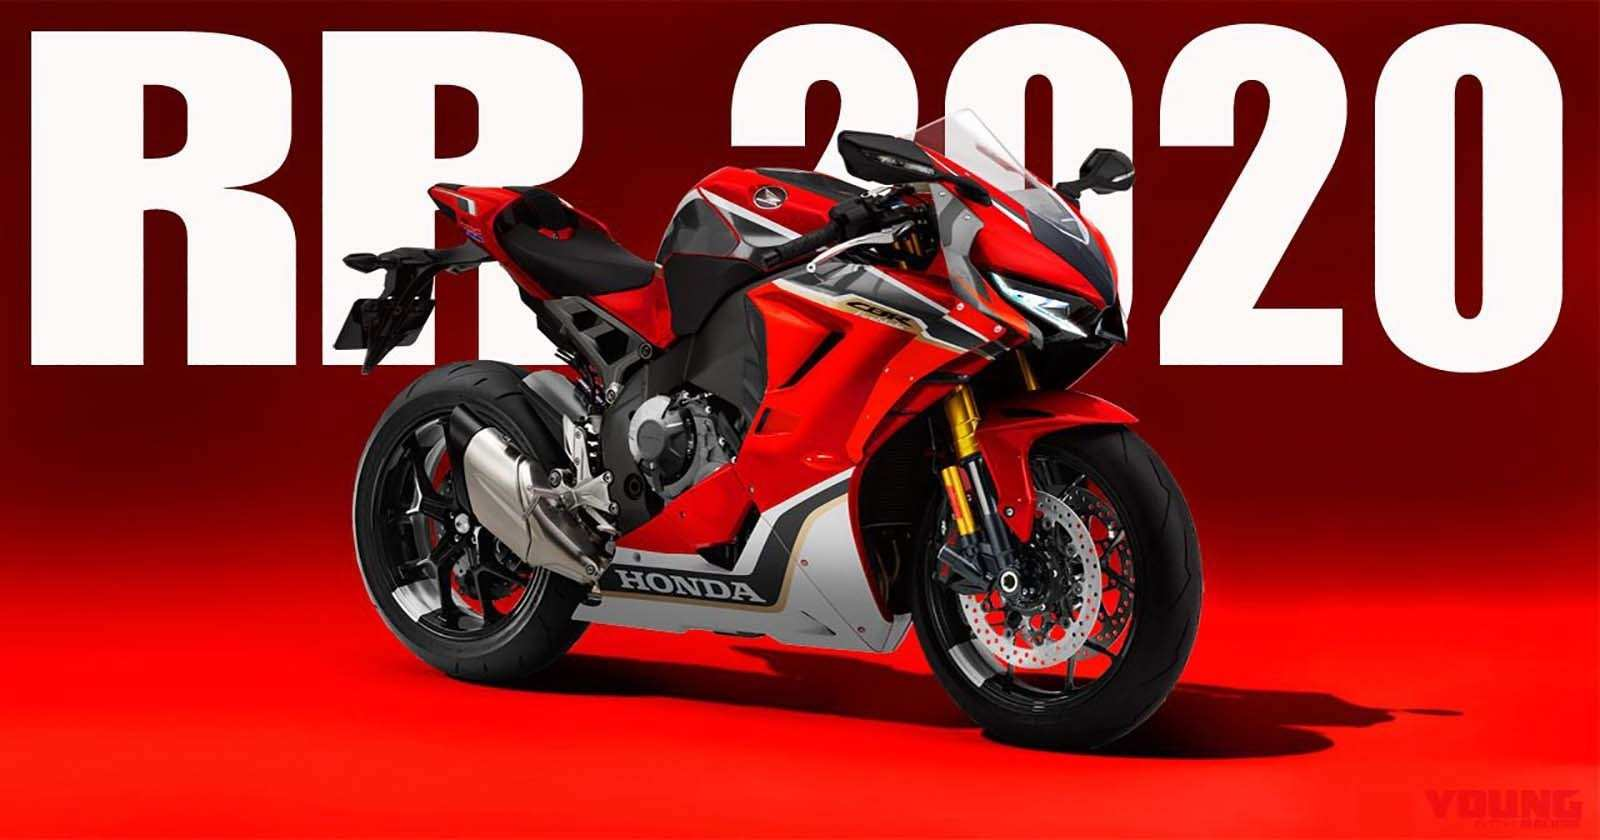 18 Concept of Honda V4 Superbike 2020 Research New with Honda V4 Superbike 2020